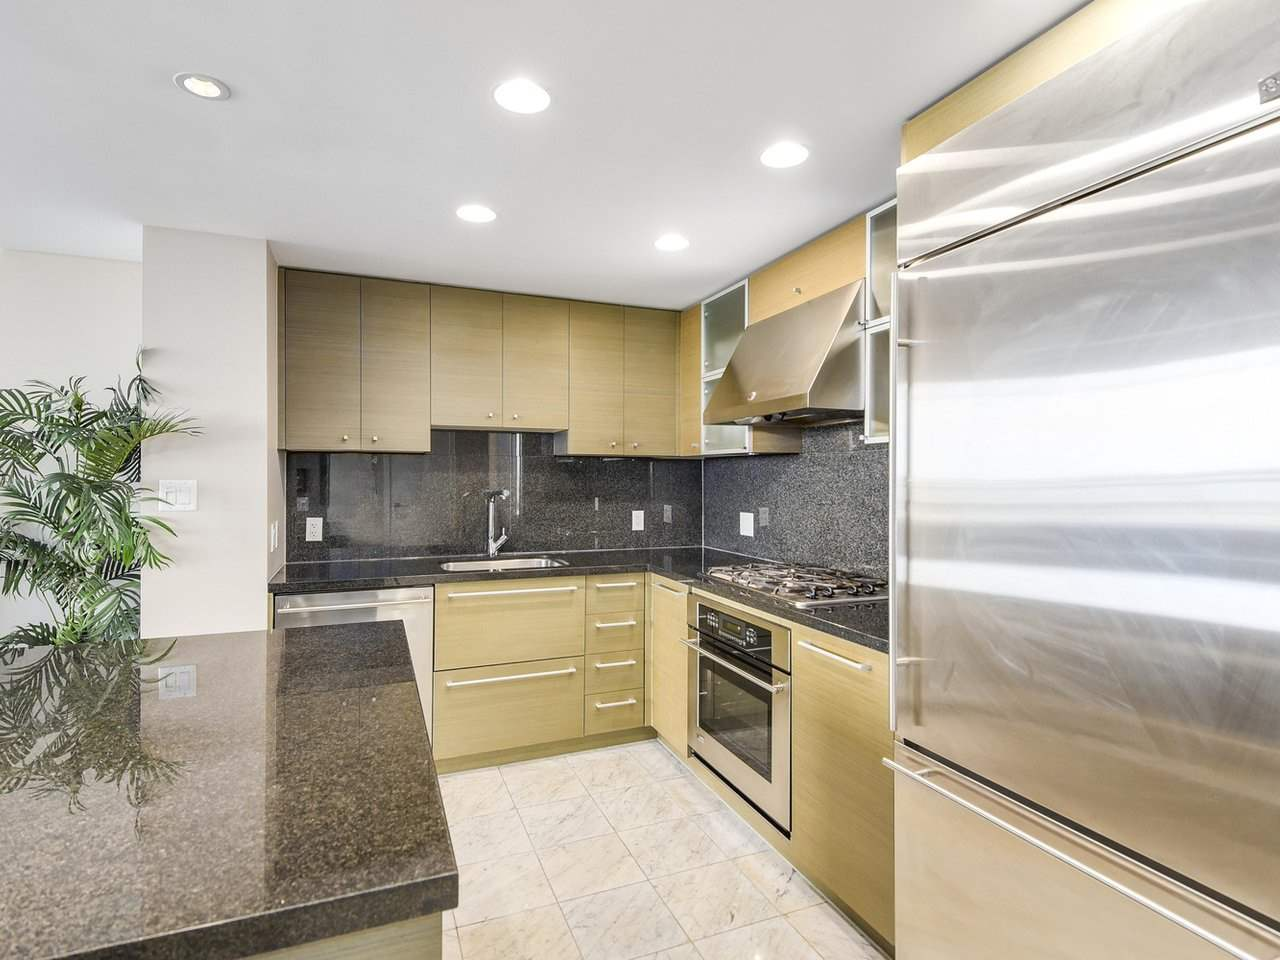 Condo Apartment at PH3 833 SEYMOUR STREET, Unit PH3, Vancouver West, British Columbia. Image 7